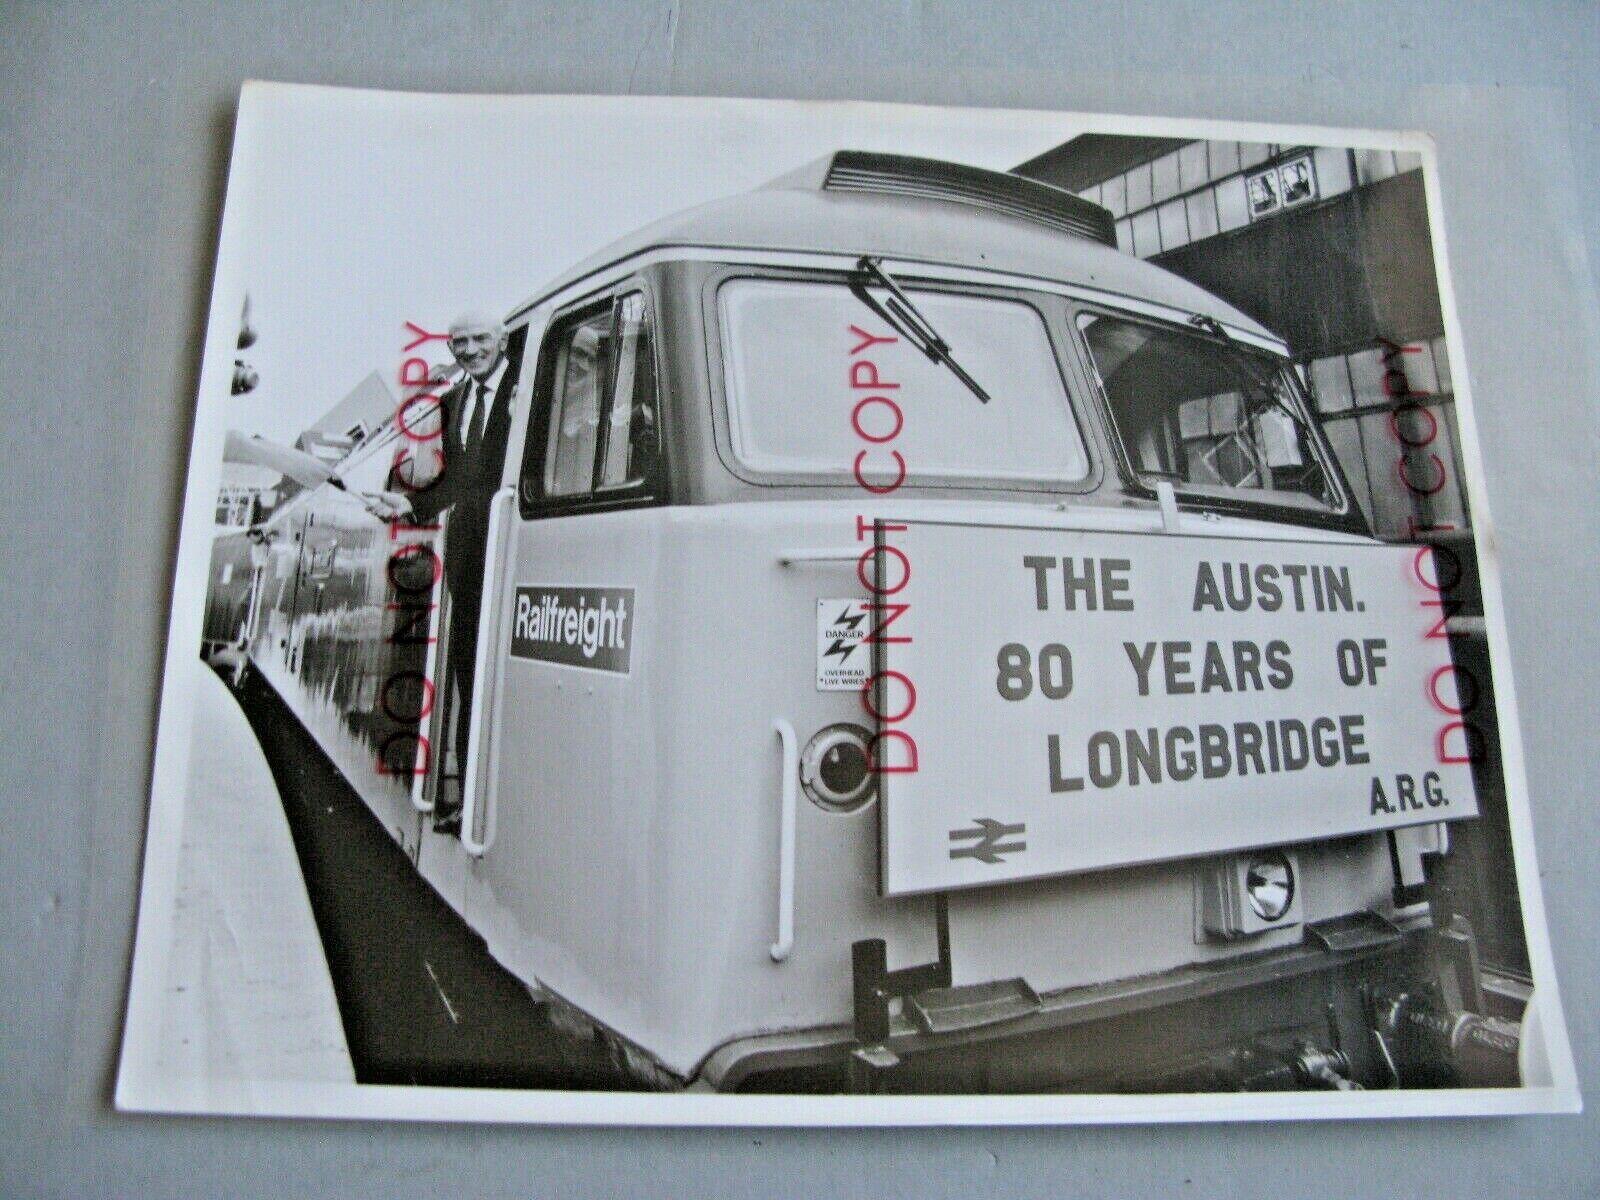 xTHE AUSTIN. 80 YEARS OF LONGBRIDGE PHOTO 10